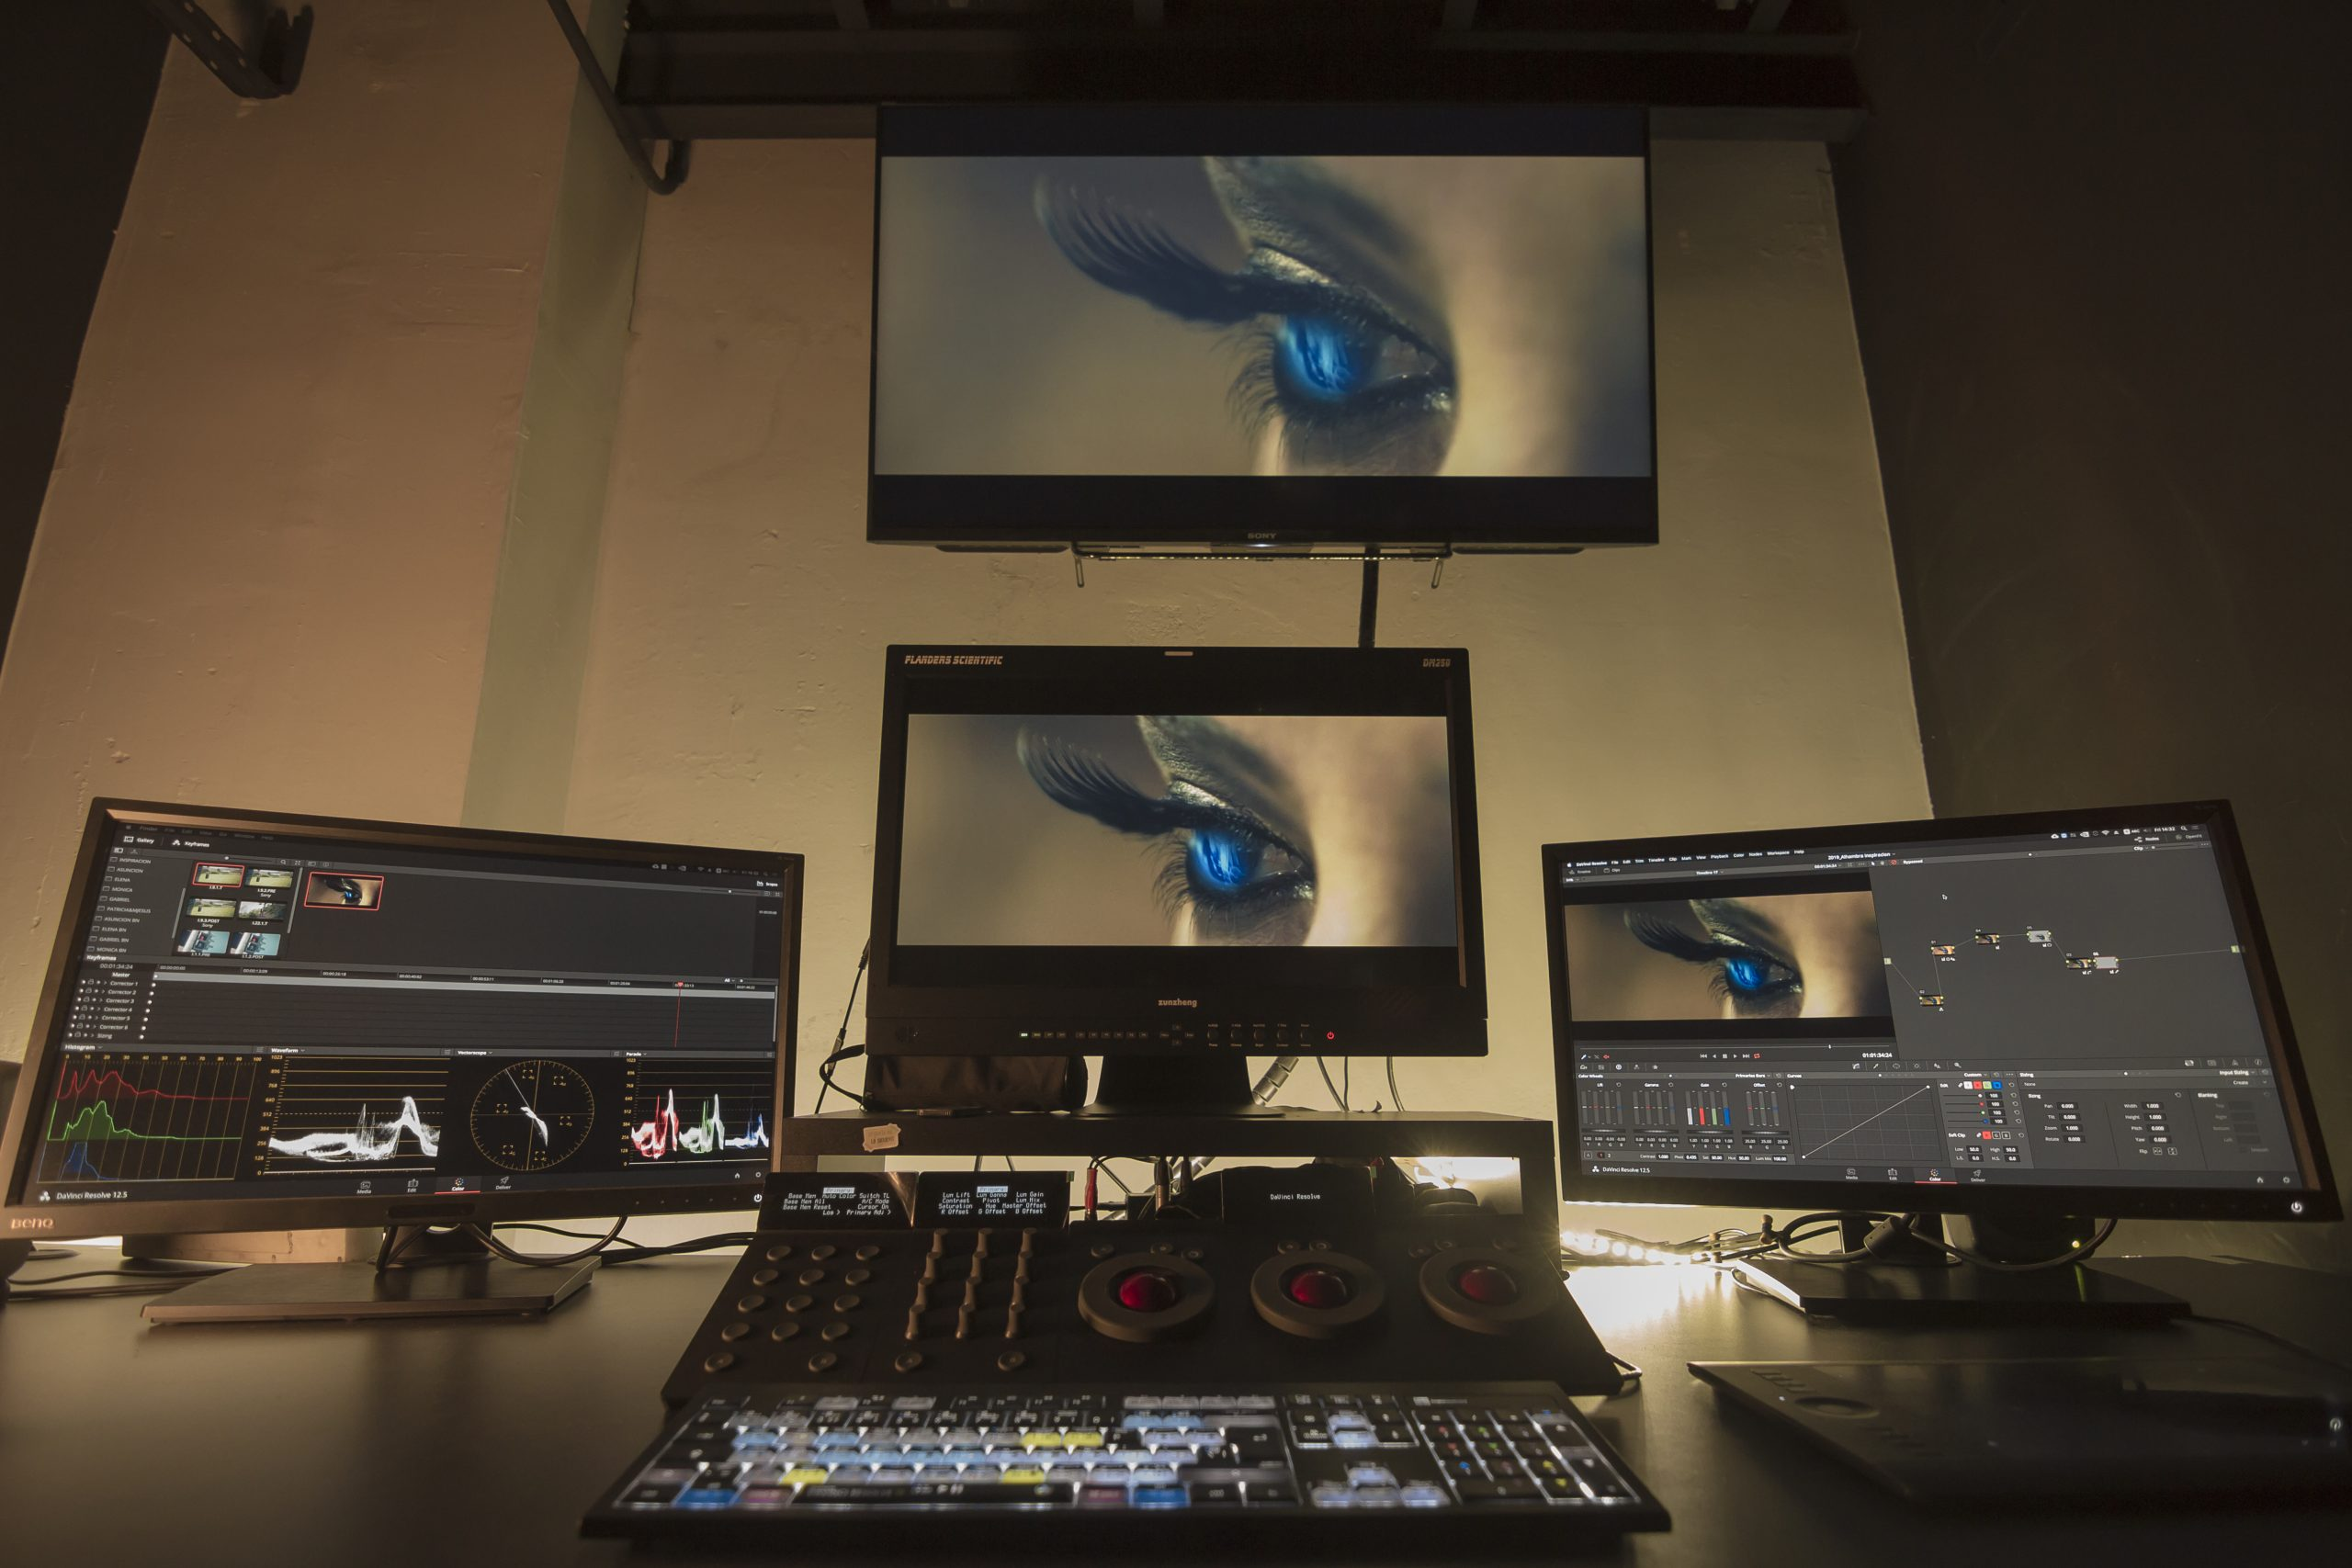 etalonaje nolich color grading audiovisual valencia postpo alquiler sala postpo